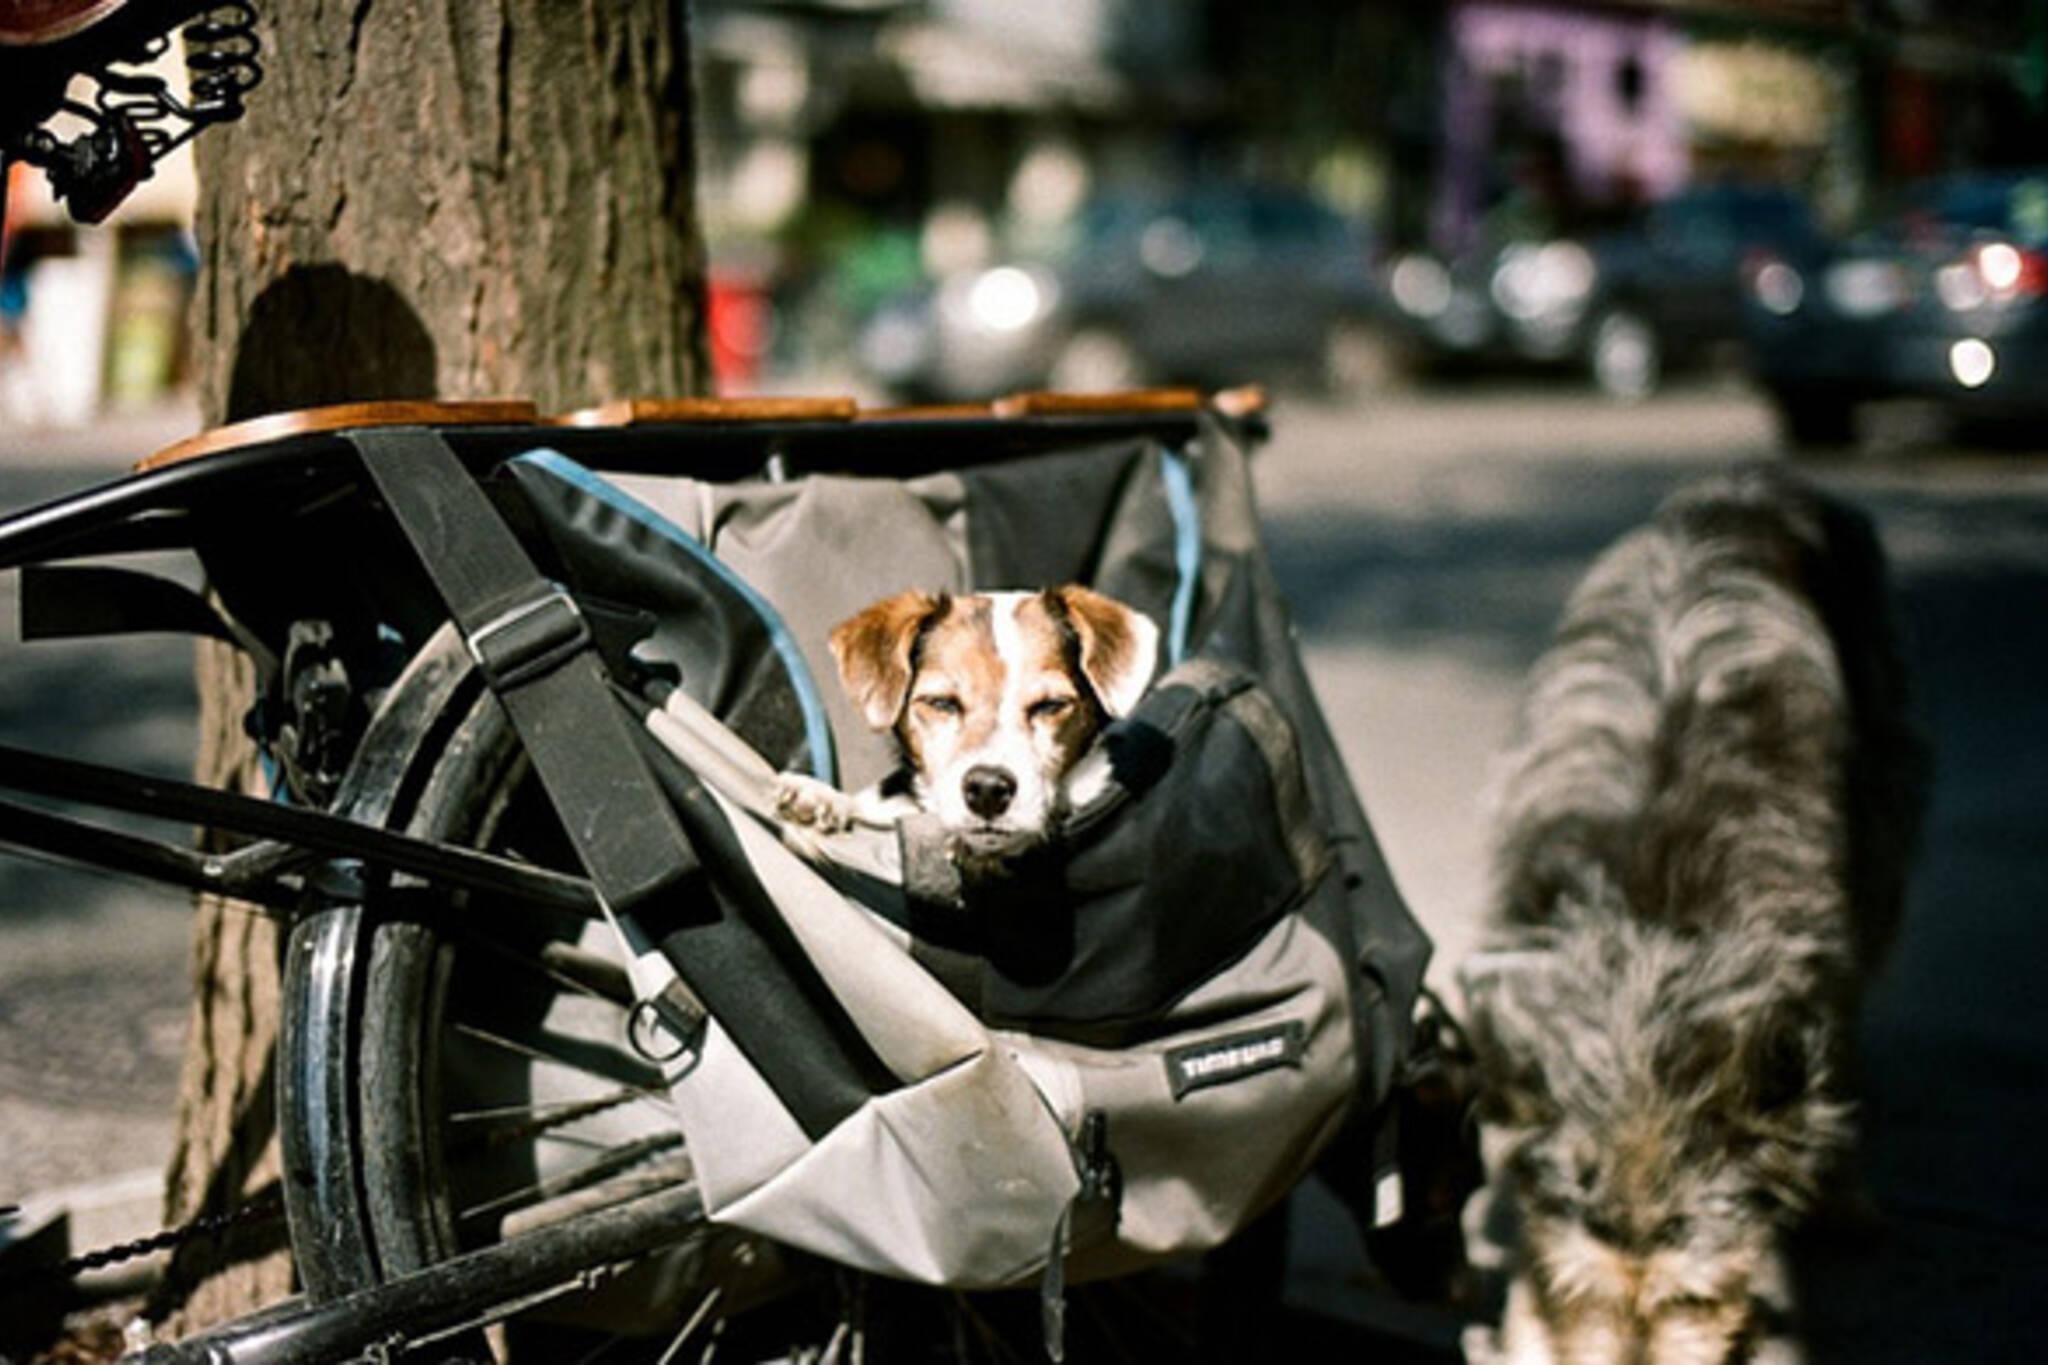 dog, bag, bike